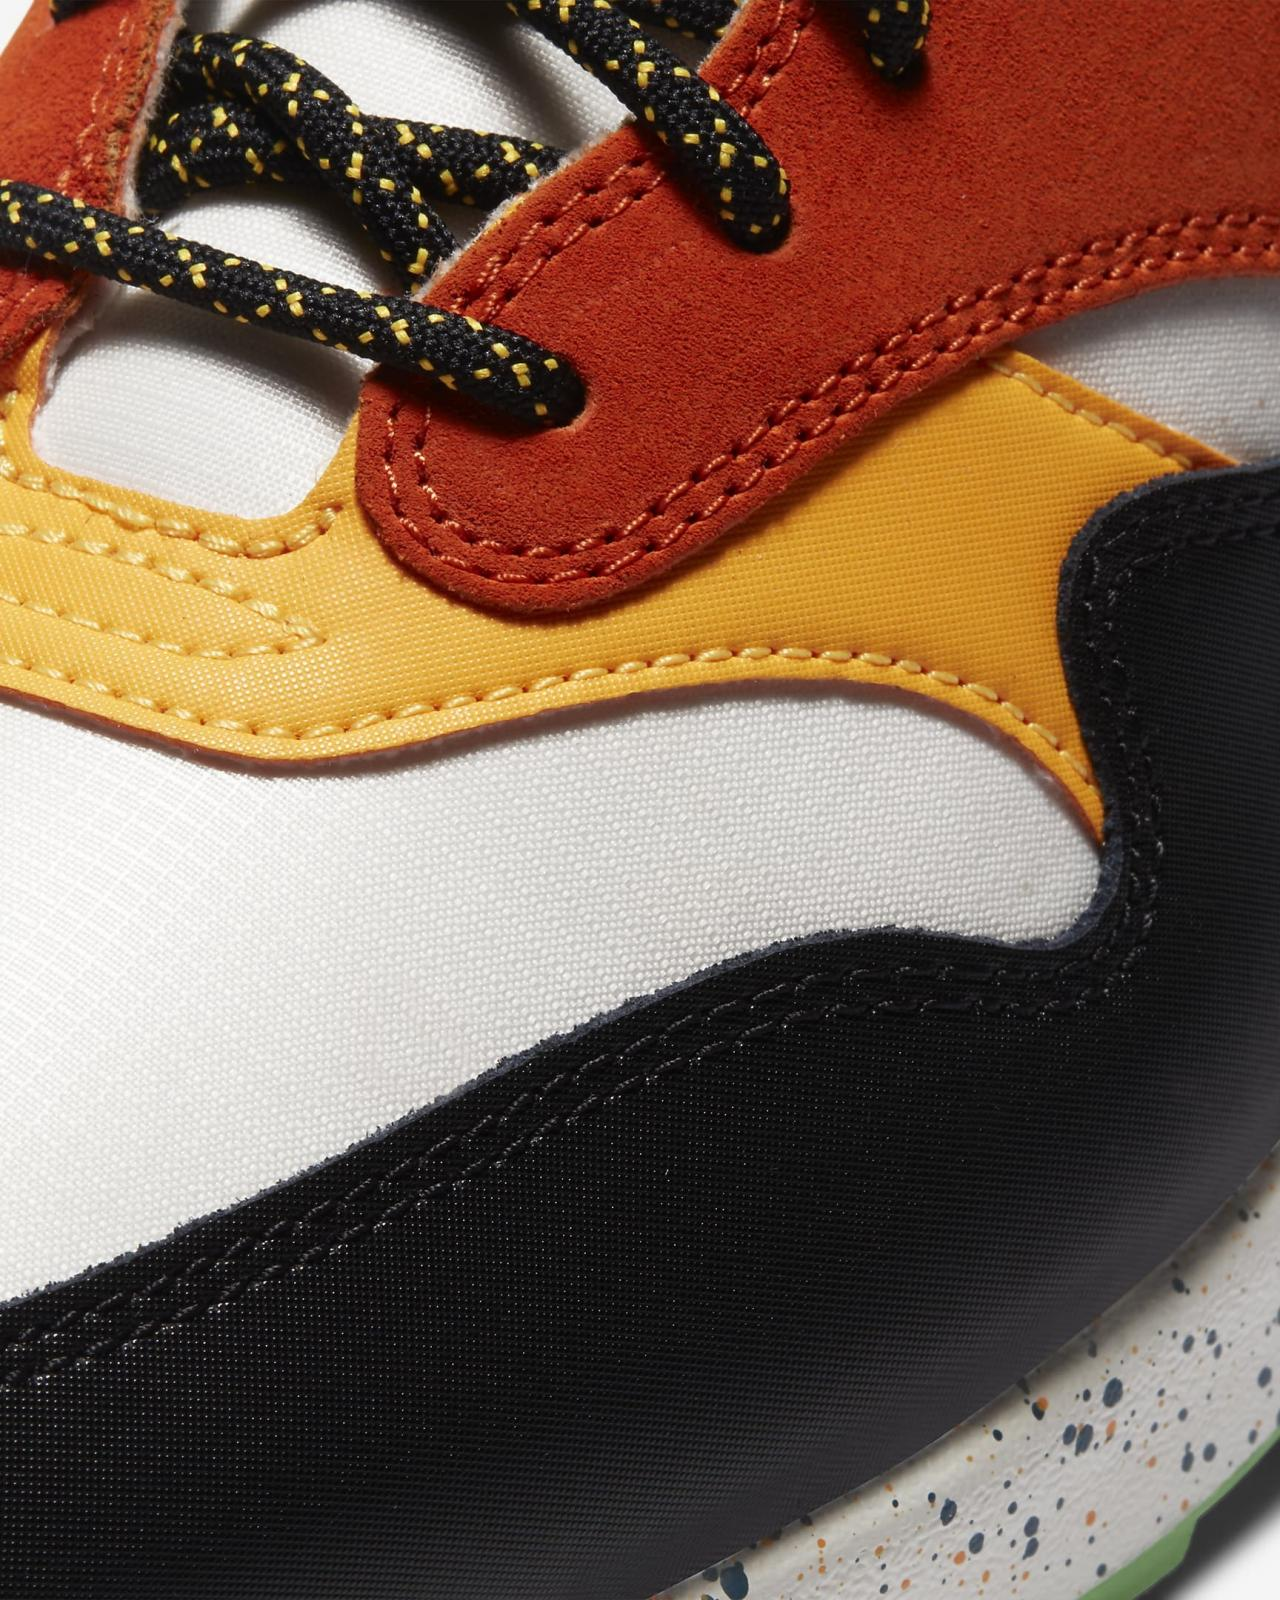 Nike Sportswear推出全新幻影灰/深渊绿/海星橙/黑色Air Max 1